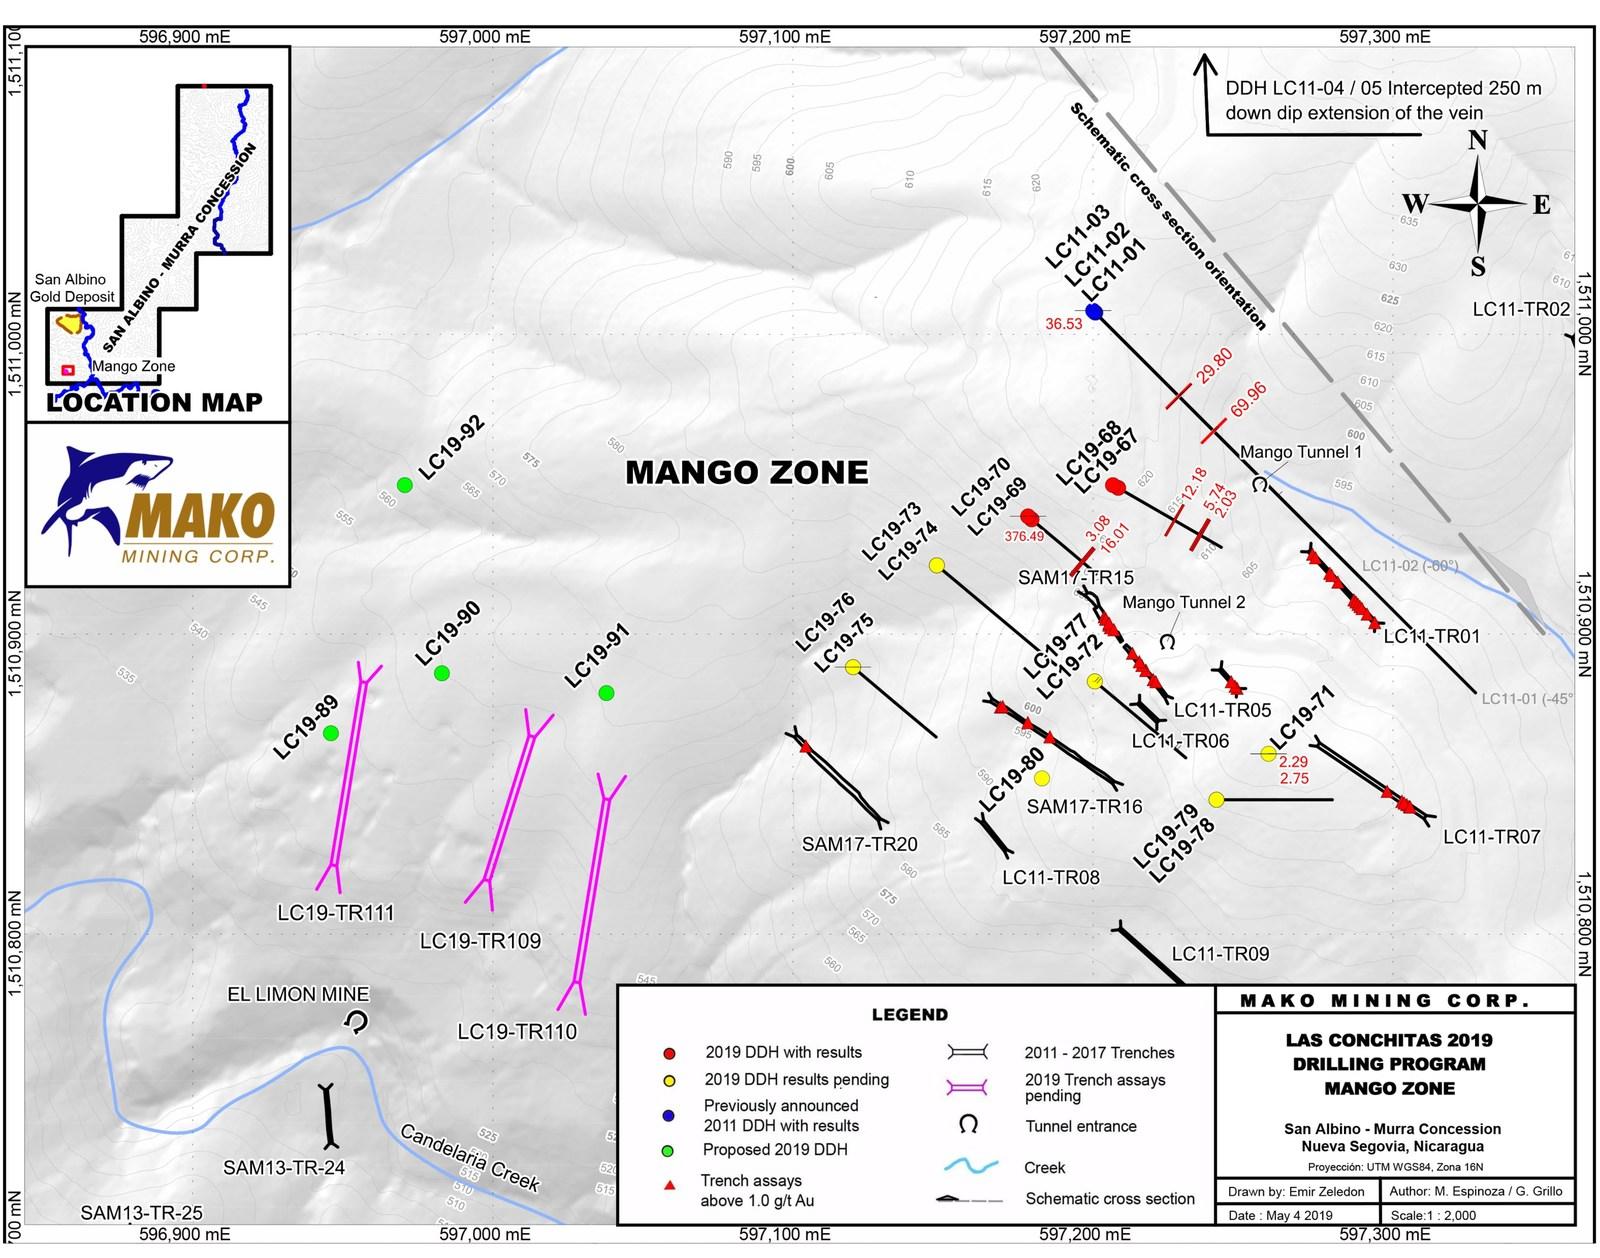 Las Conchitas 2019 Drilling Program Mango Zone